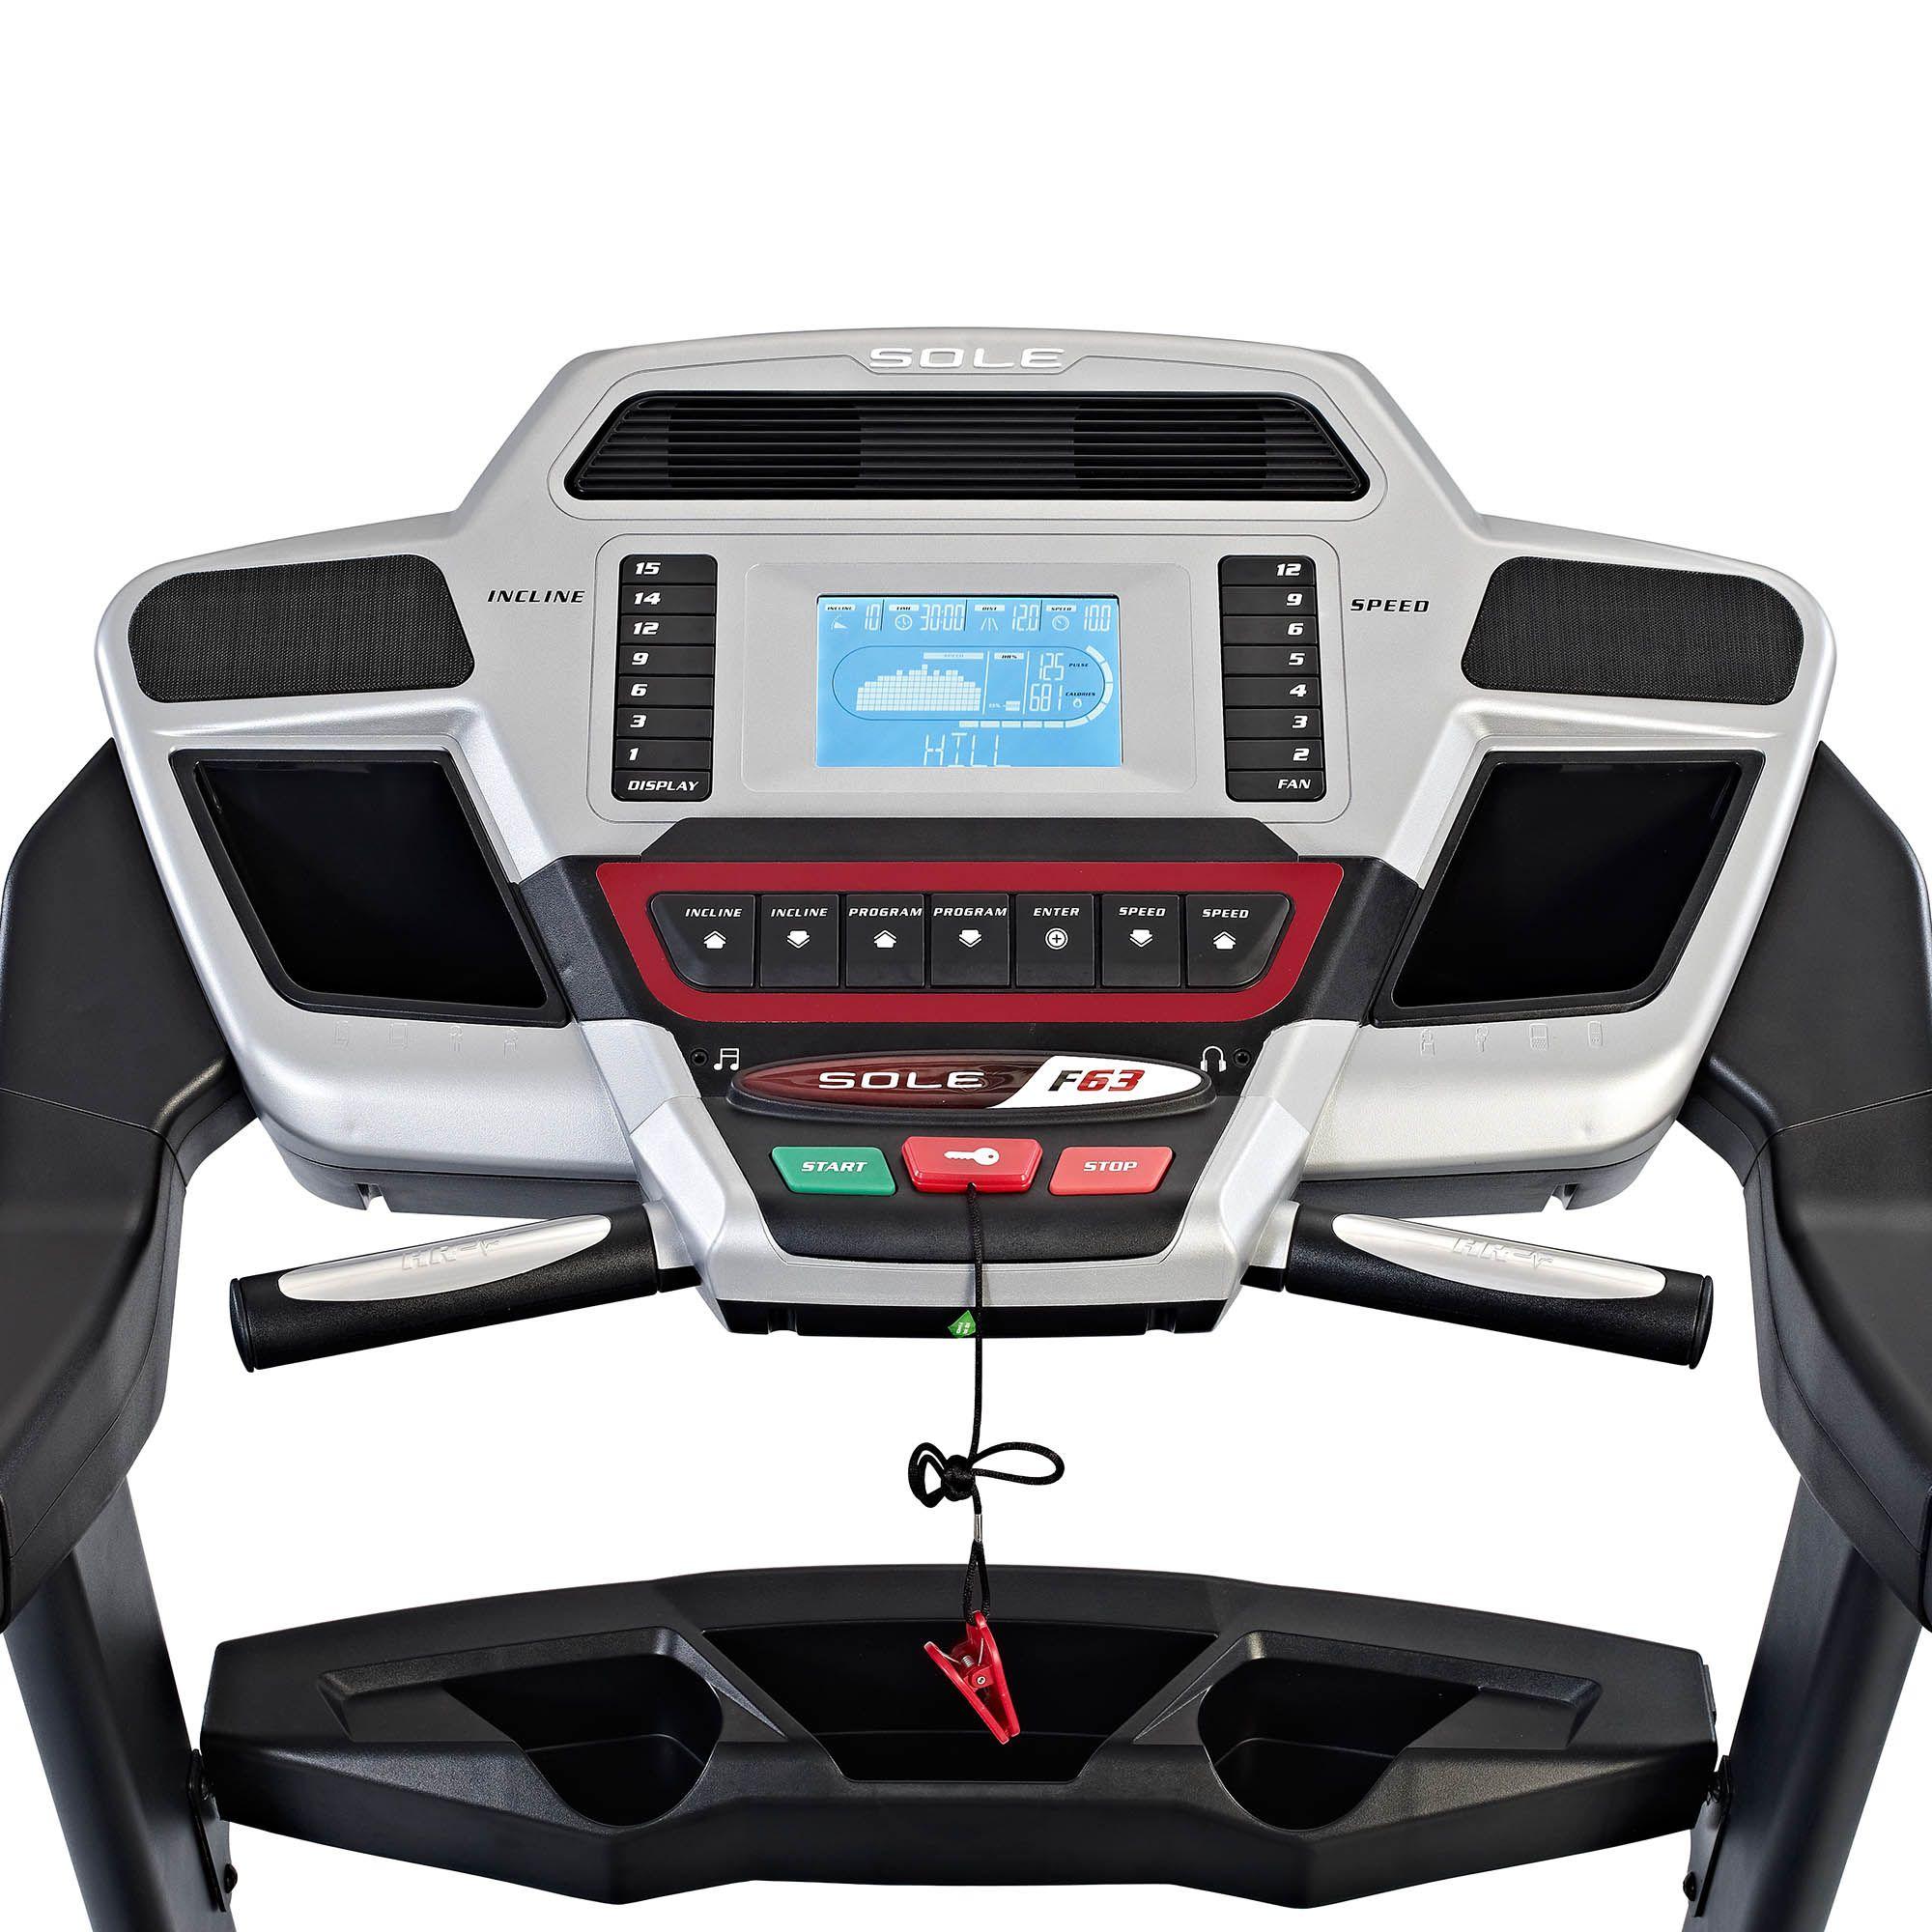 Sole Treadmill Order Tracking: Sole F63 Treadmill